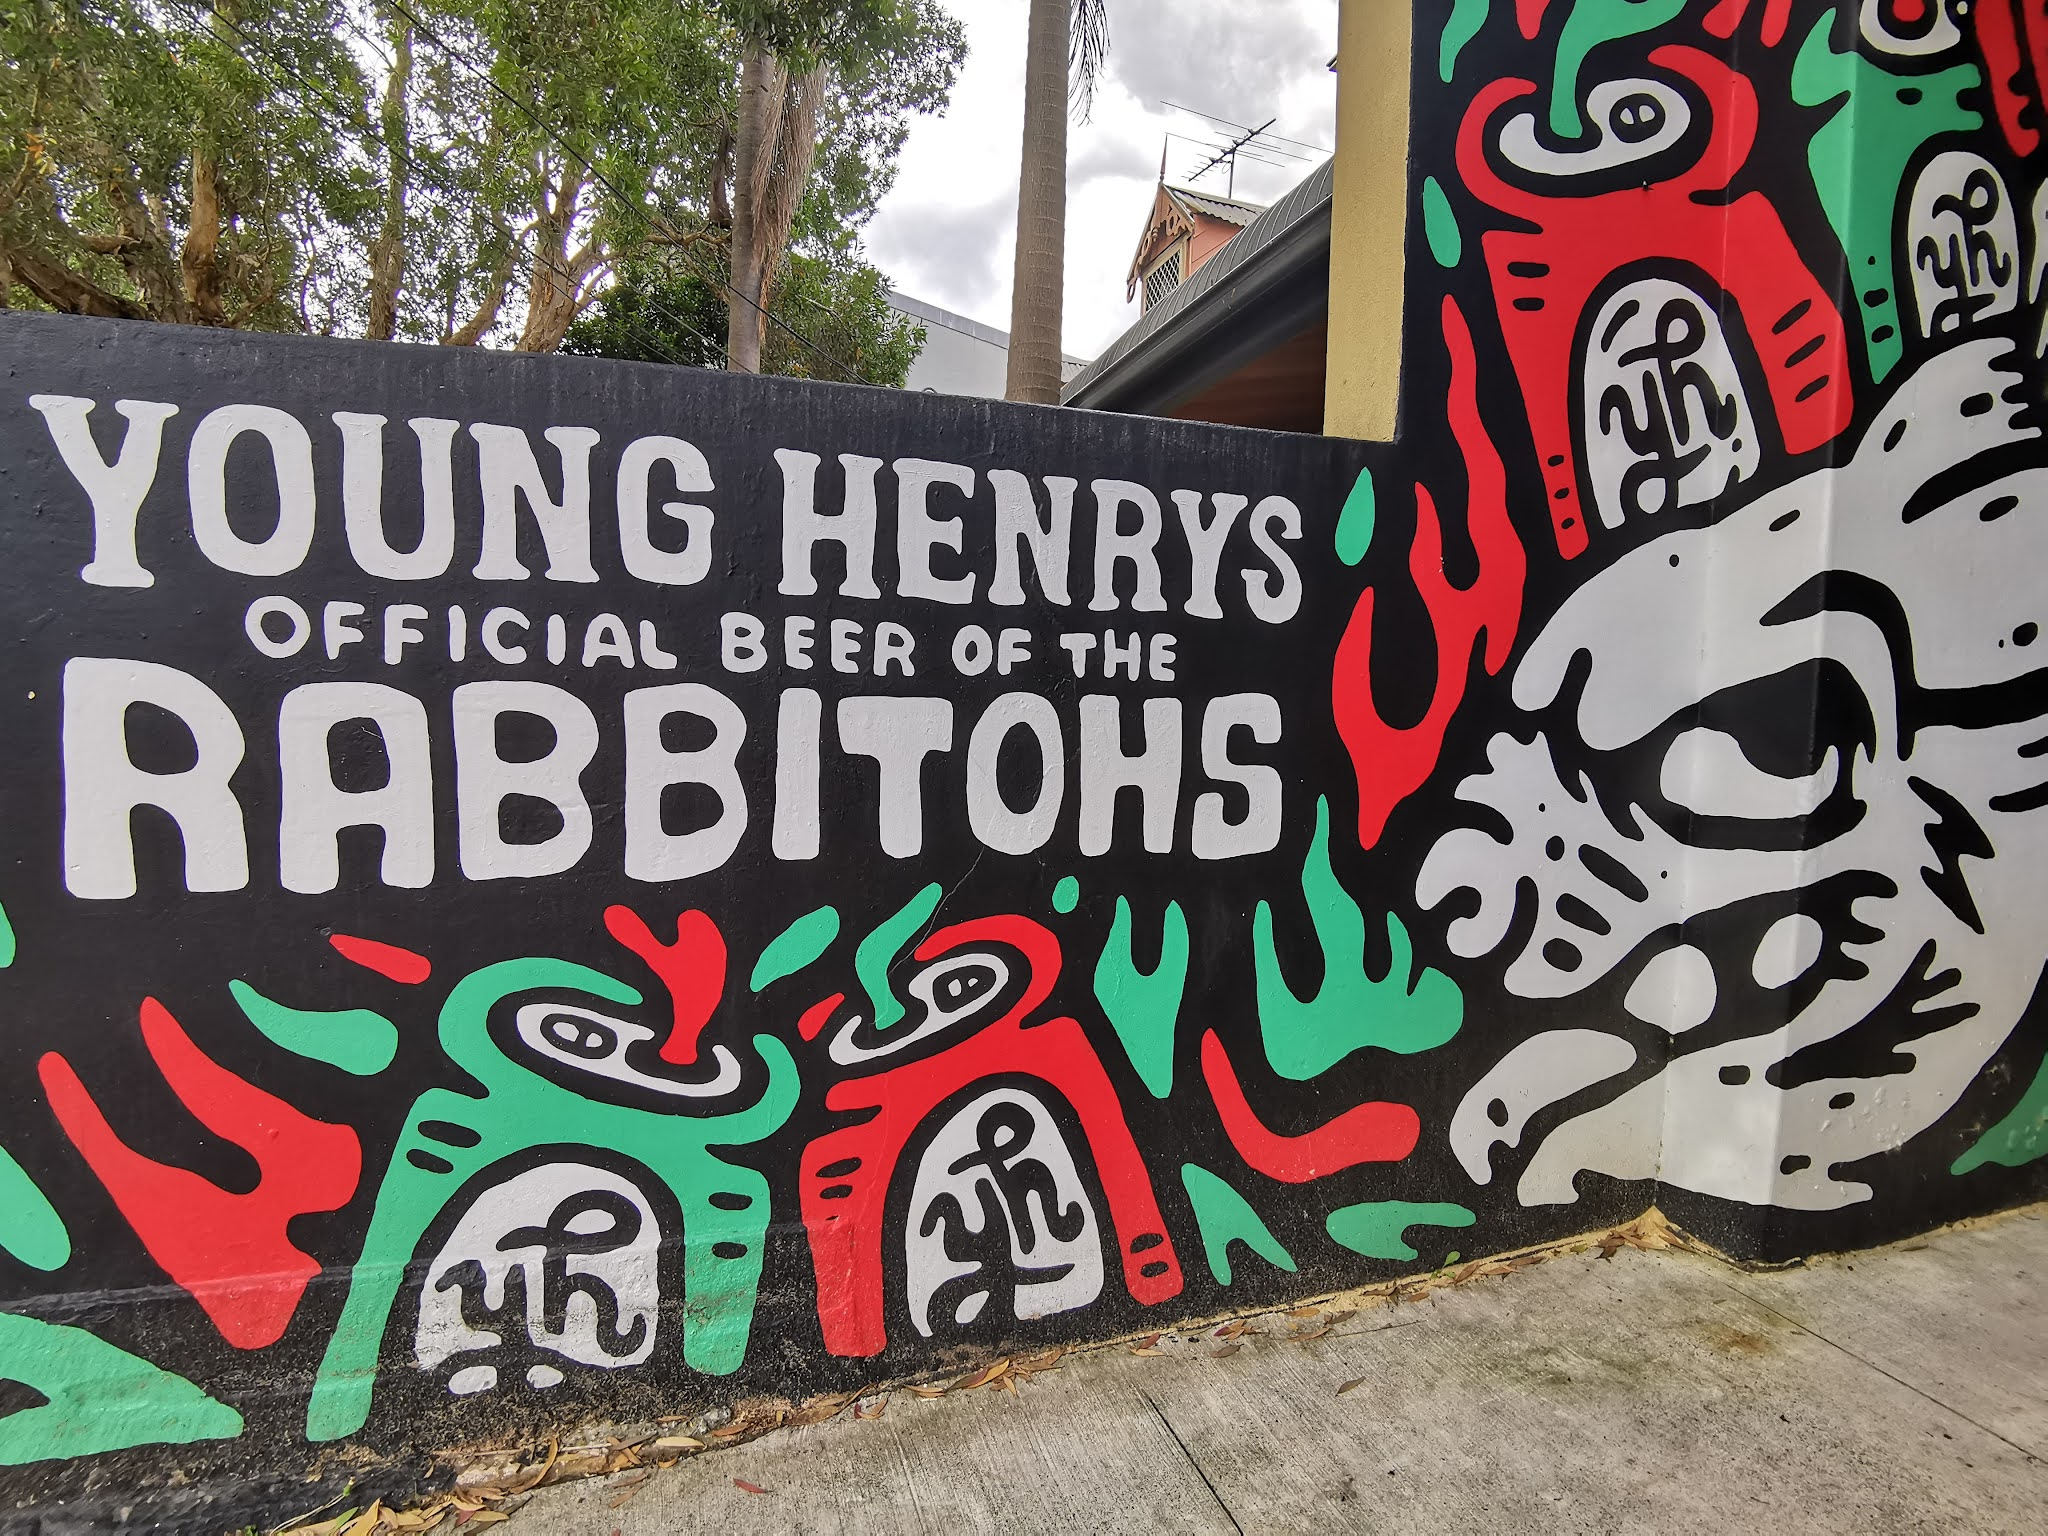 Waterloo Street Art   Rabbitoh's Mural by SindySinn